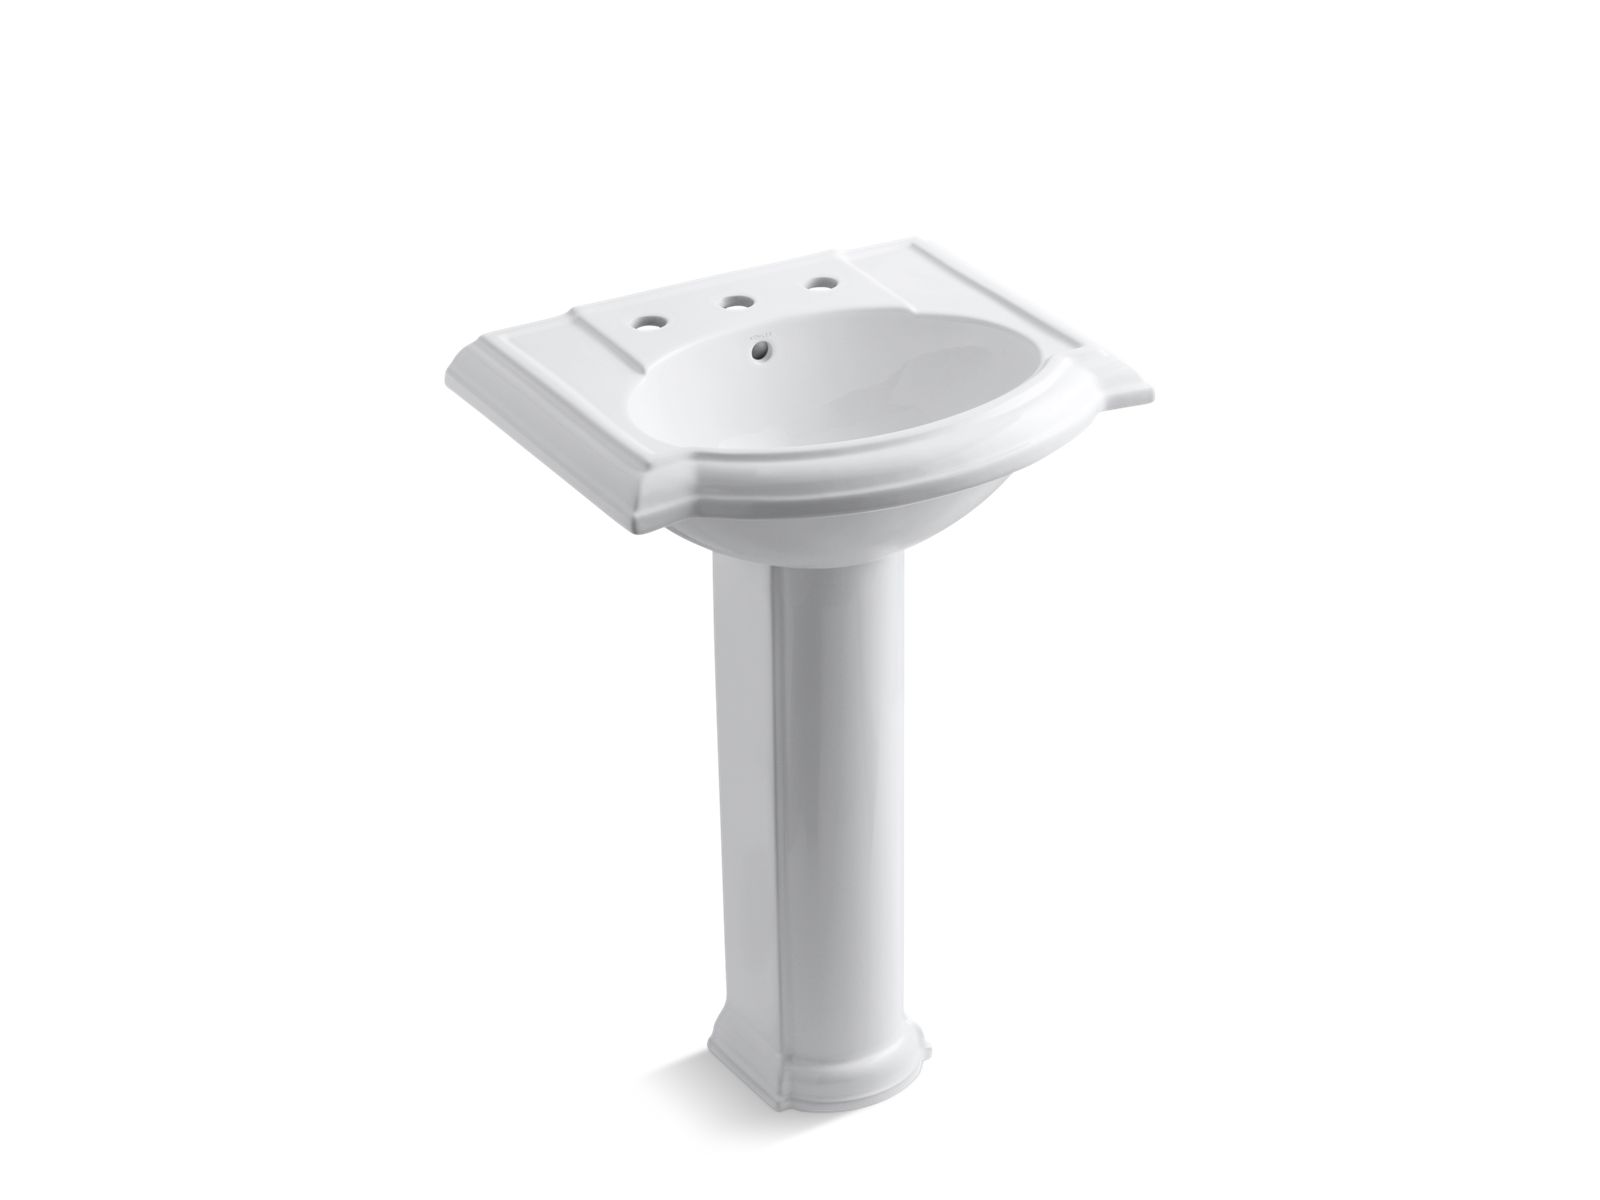 Devonshire Pedestal Sink With 8 Inch Centers K 2286 Kohler Bathroom Parts Diagram Plumbing Installation Diagrams R